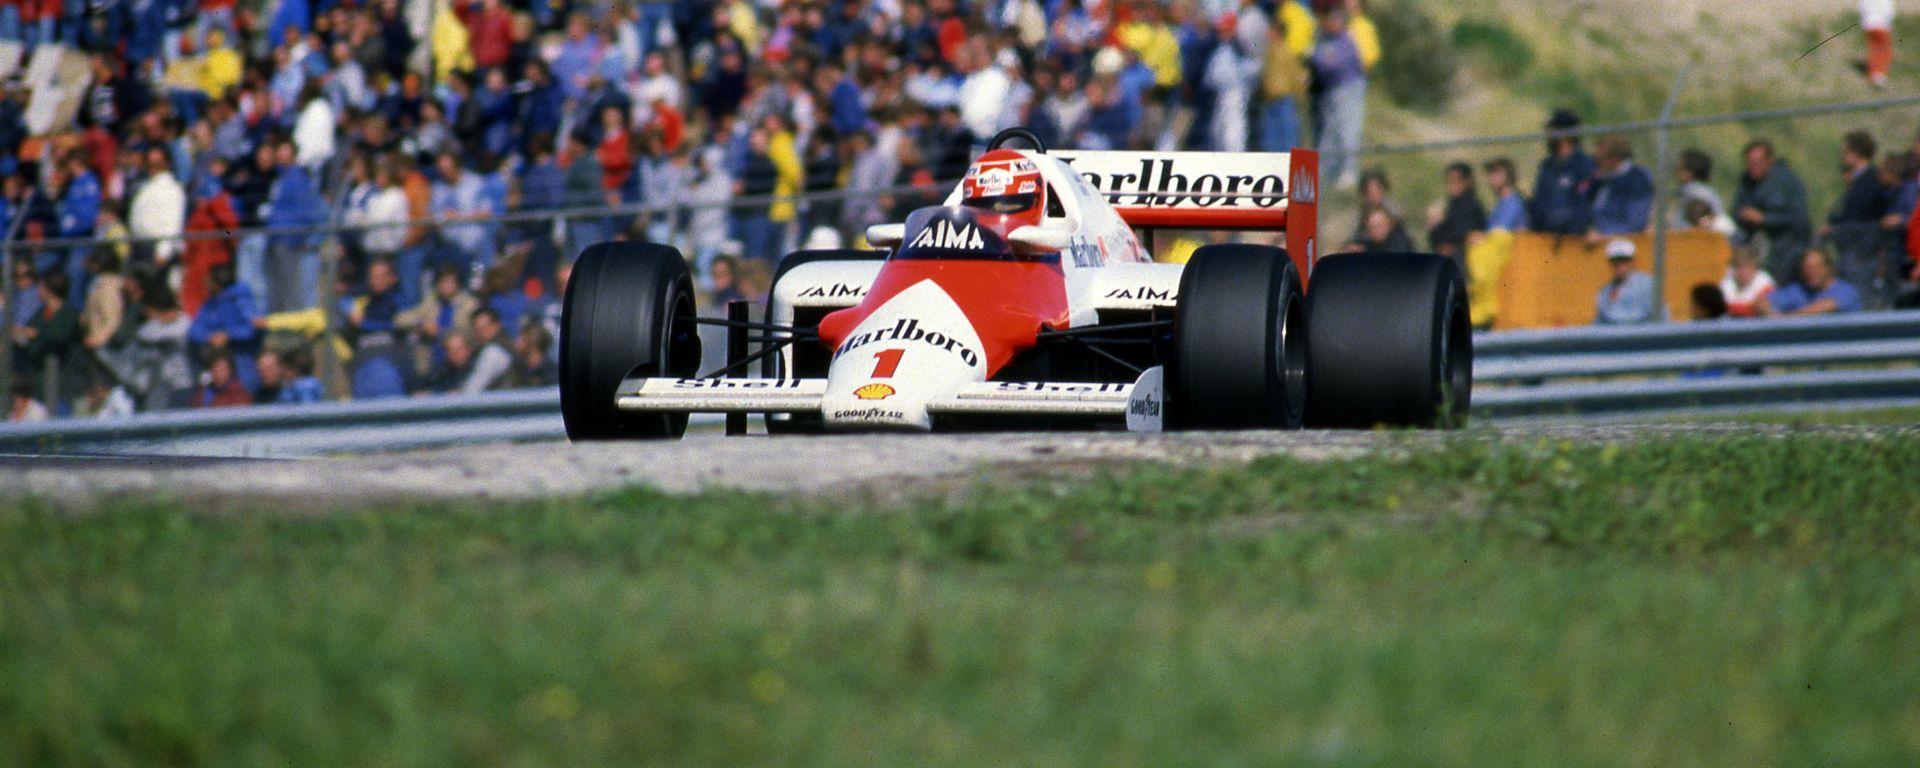 F1 GP Olanda 1985, Zandvoort: Niki Lauda (McLaren)